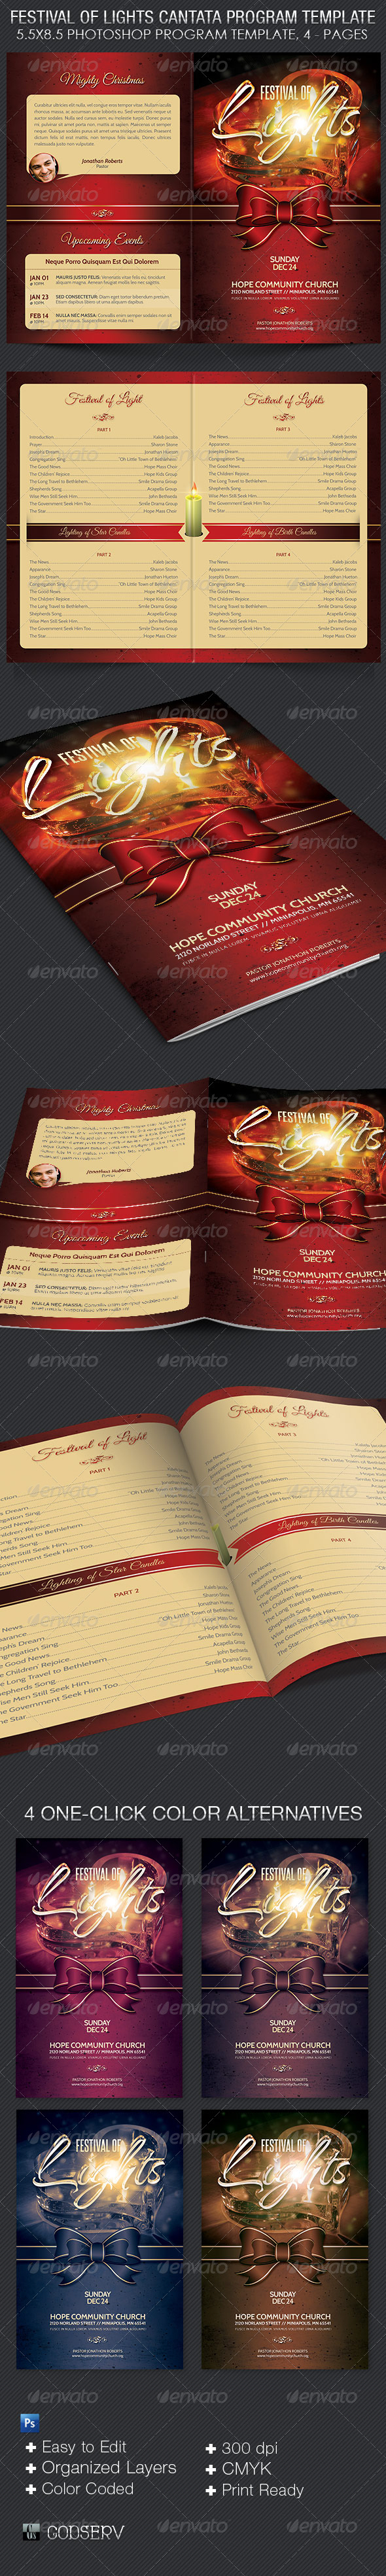 GraphicRiver Festival of Lights Christmas Program Template 6390403